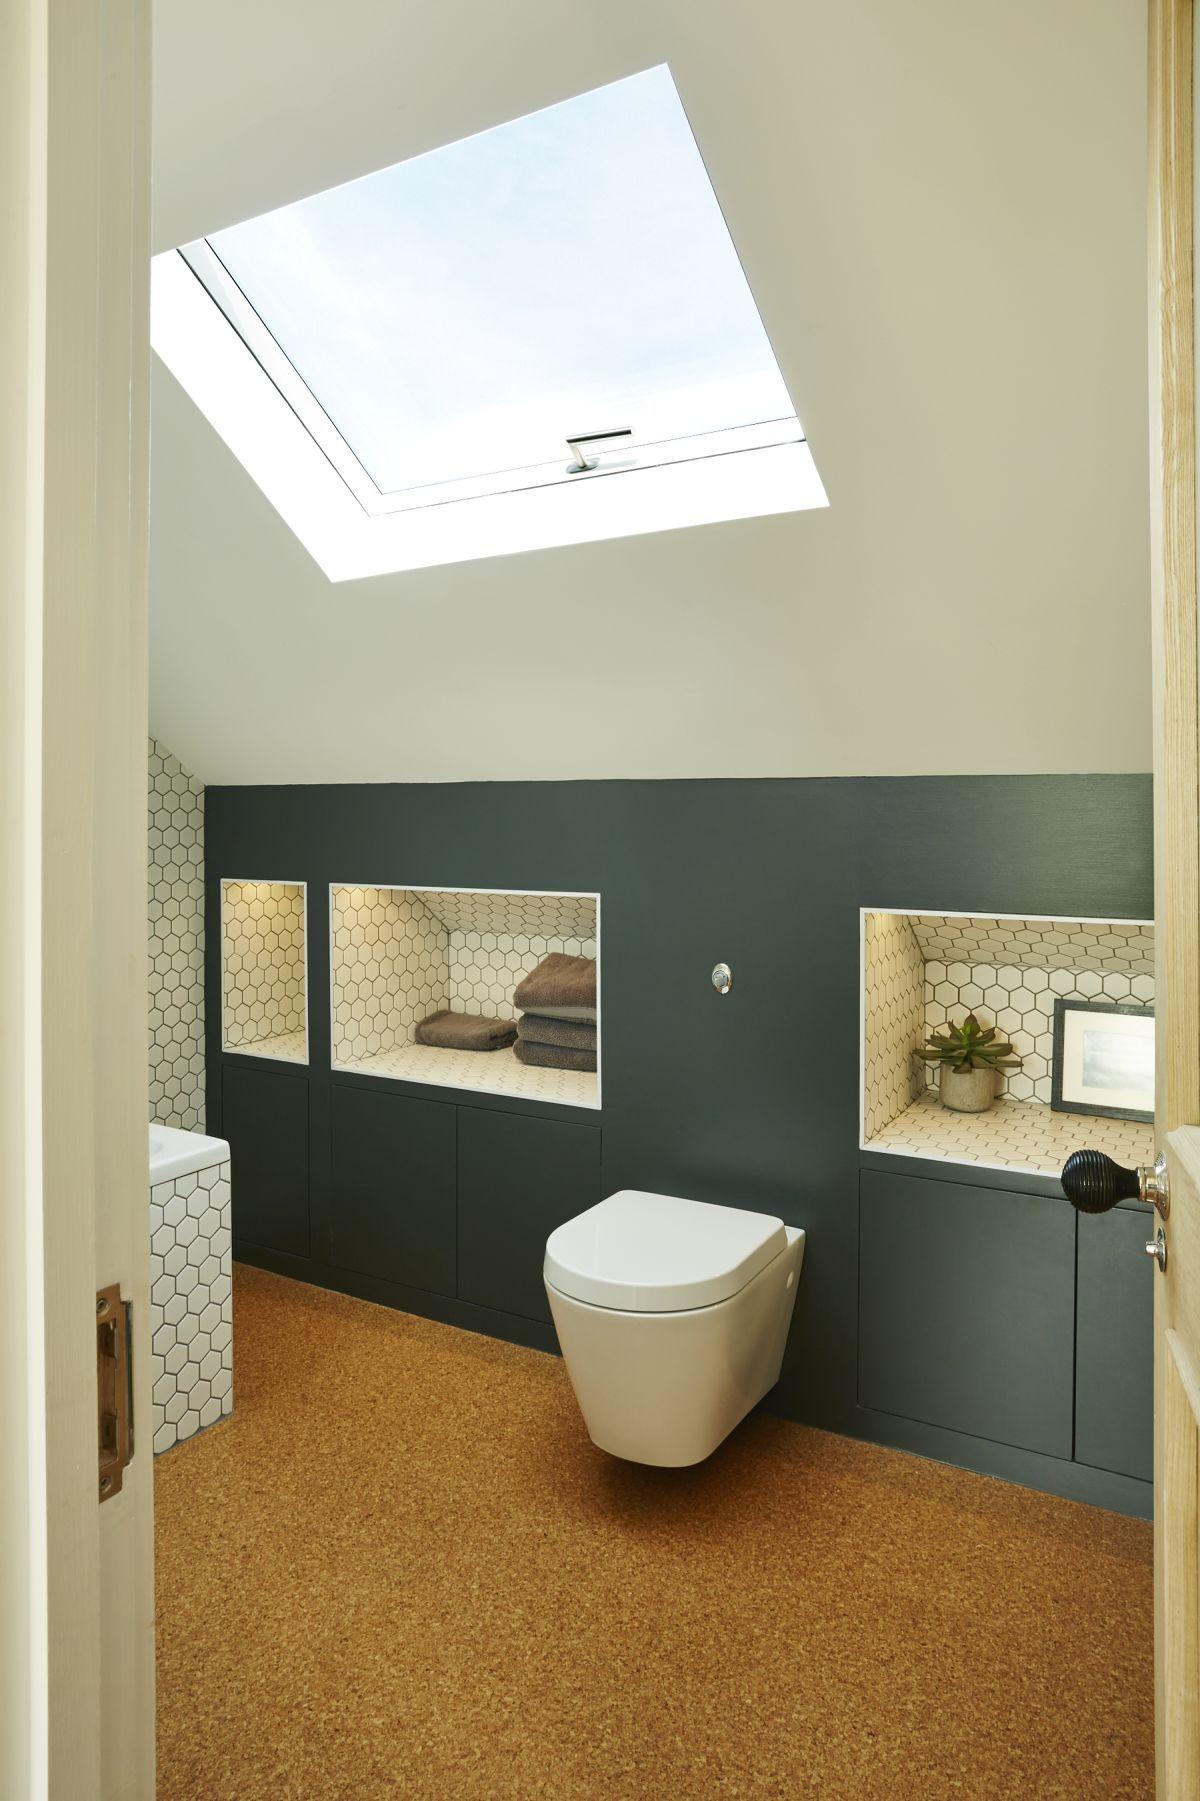 Loft Conversion Ideas And Expert Tips In 2020 Attic Bedroom Storage Small Bathroom Loft Bathroom